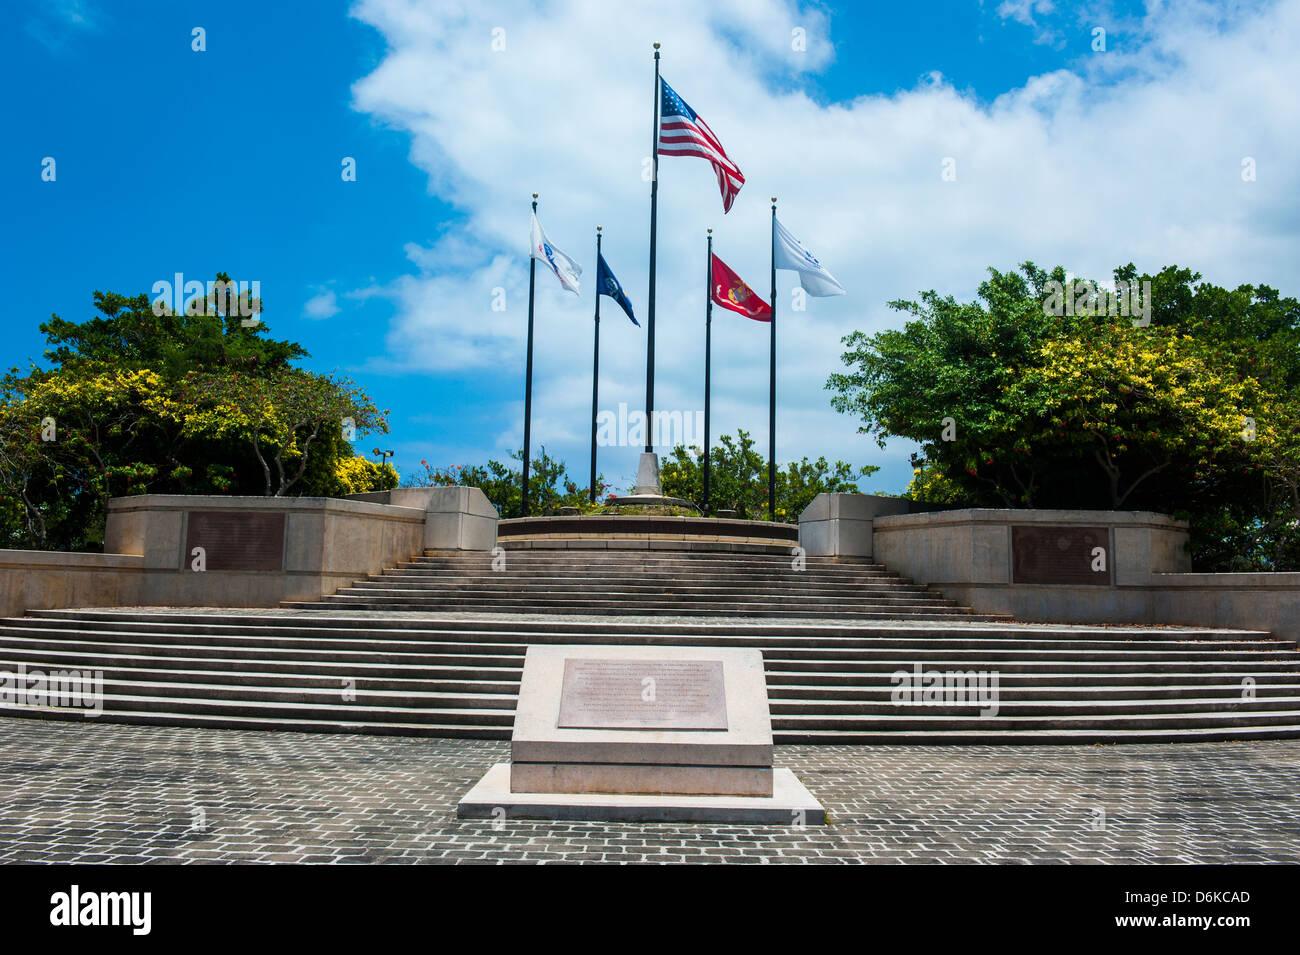 American Memorial Park, Saipan, Northern Marianas, Central Pacific, Pacific - Stock Image